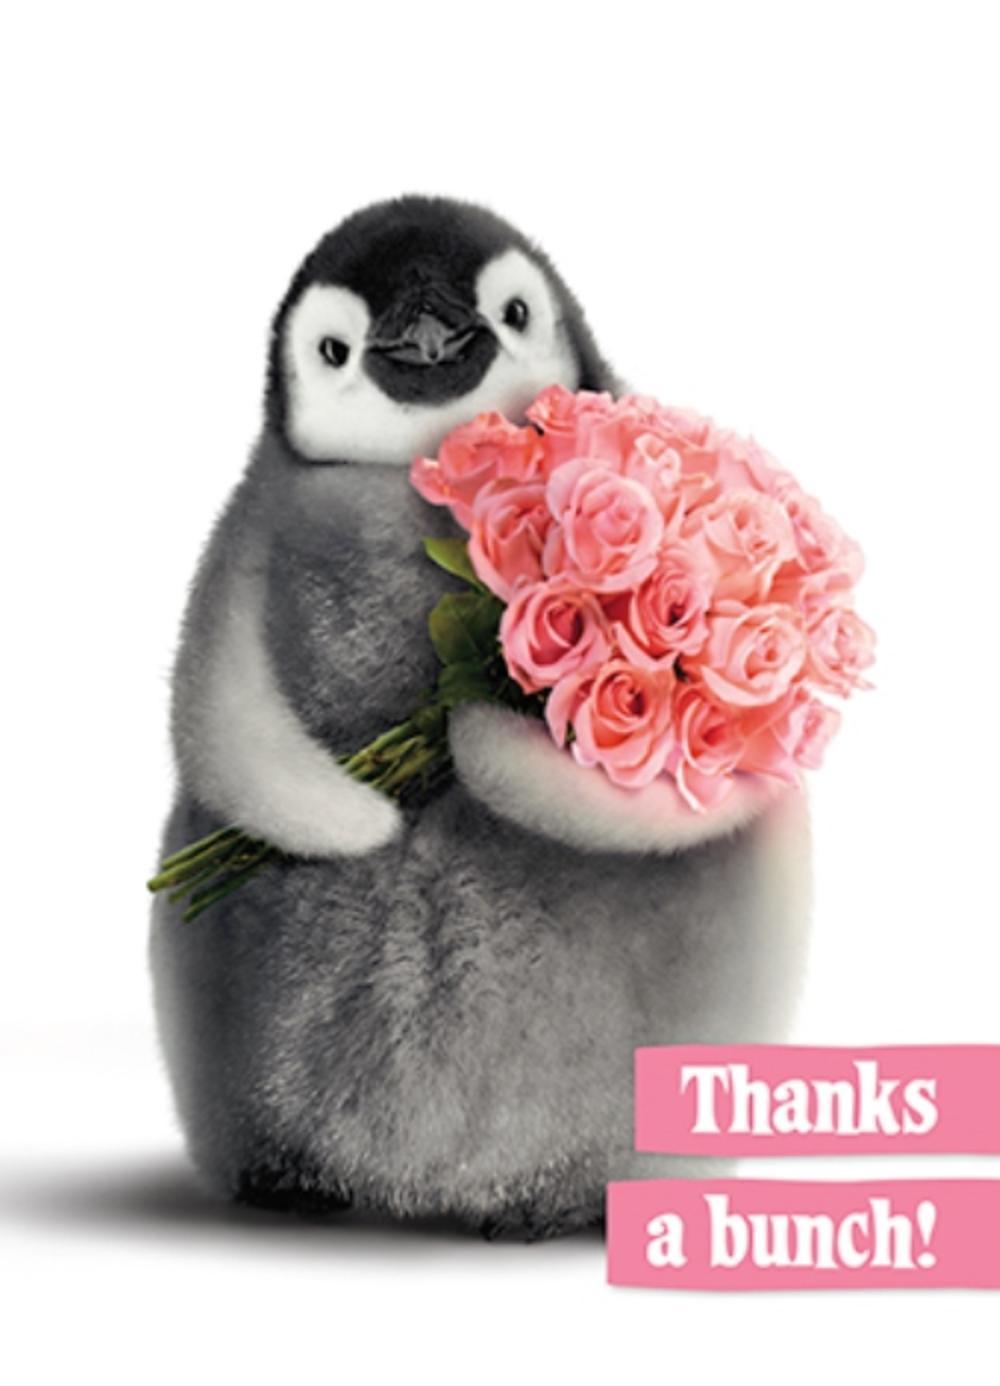 Avanti Thanks A Bunch Thank You Greeting Card